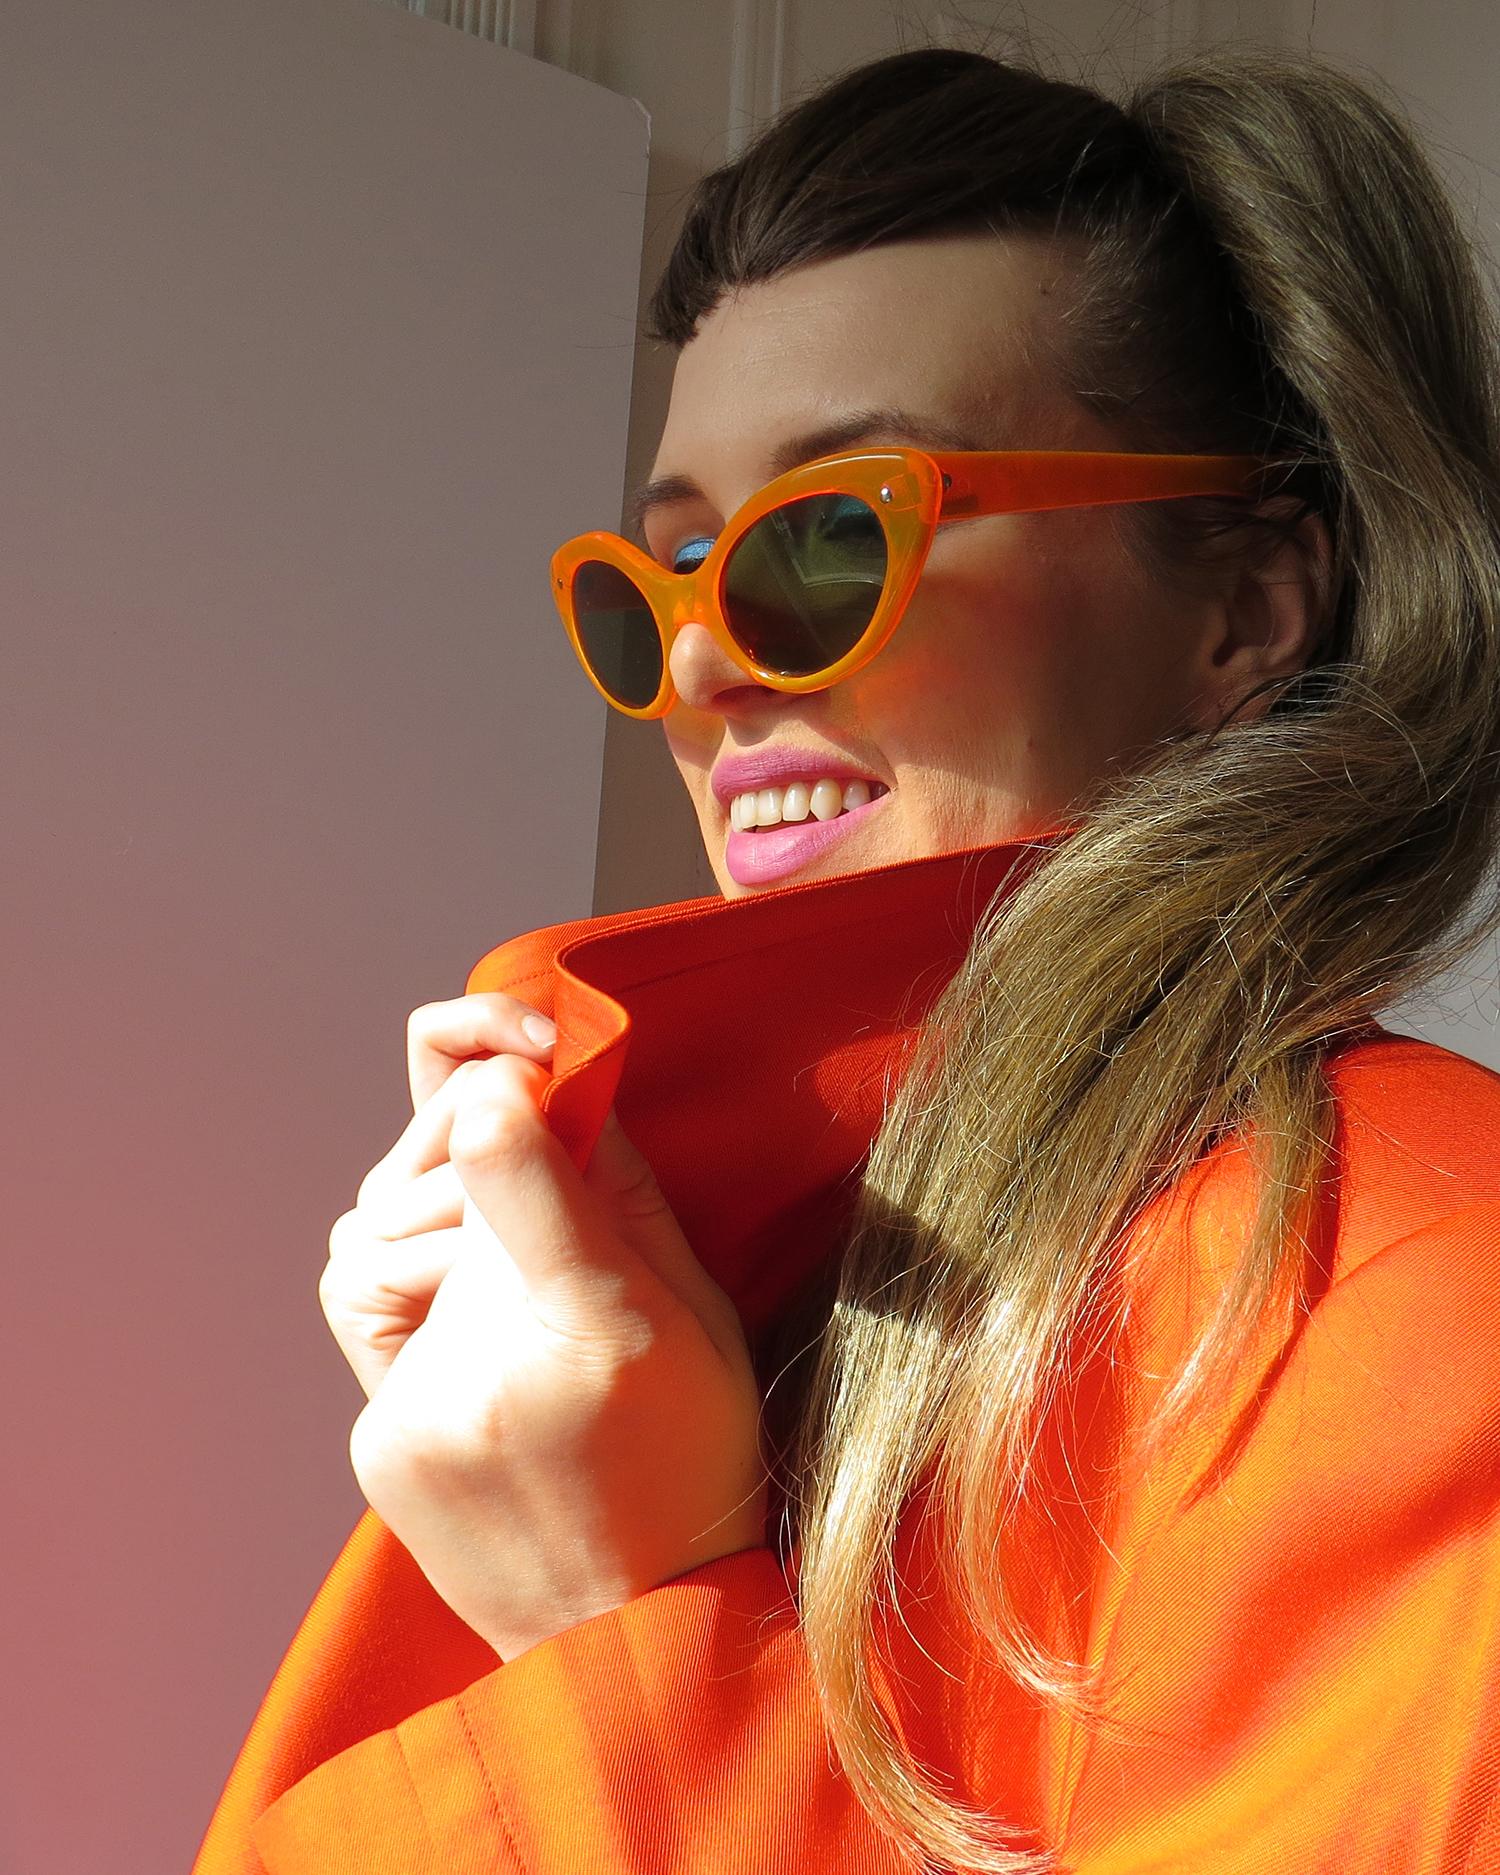 EYEWEAR - High Femme Optical and Sun